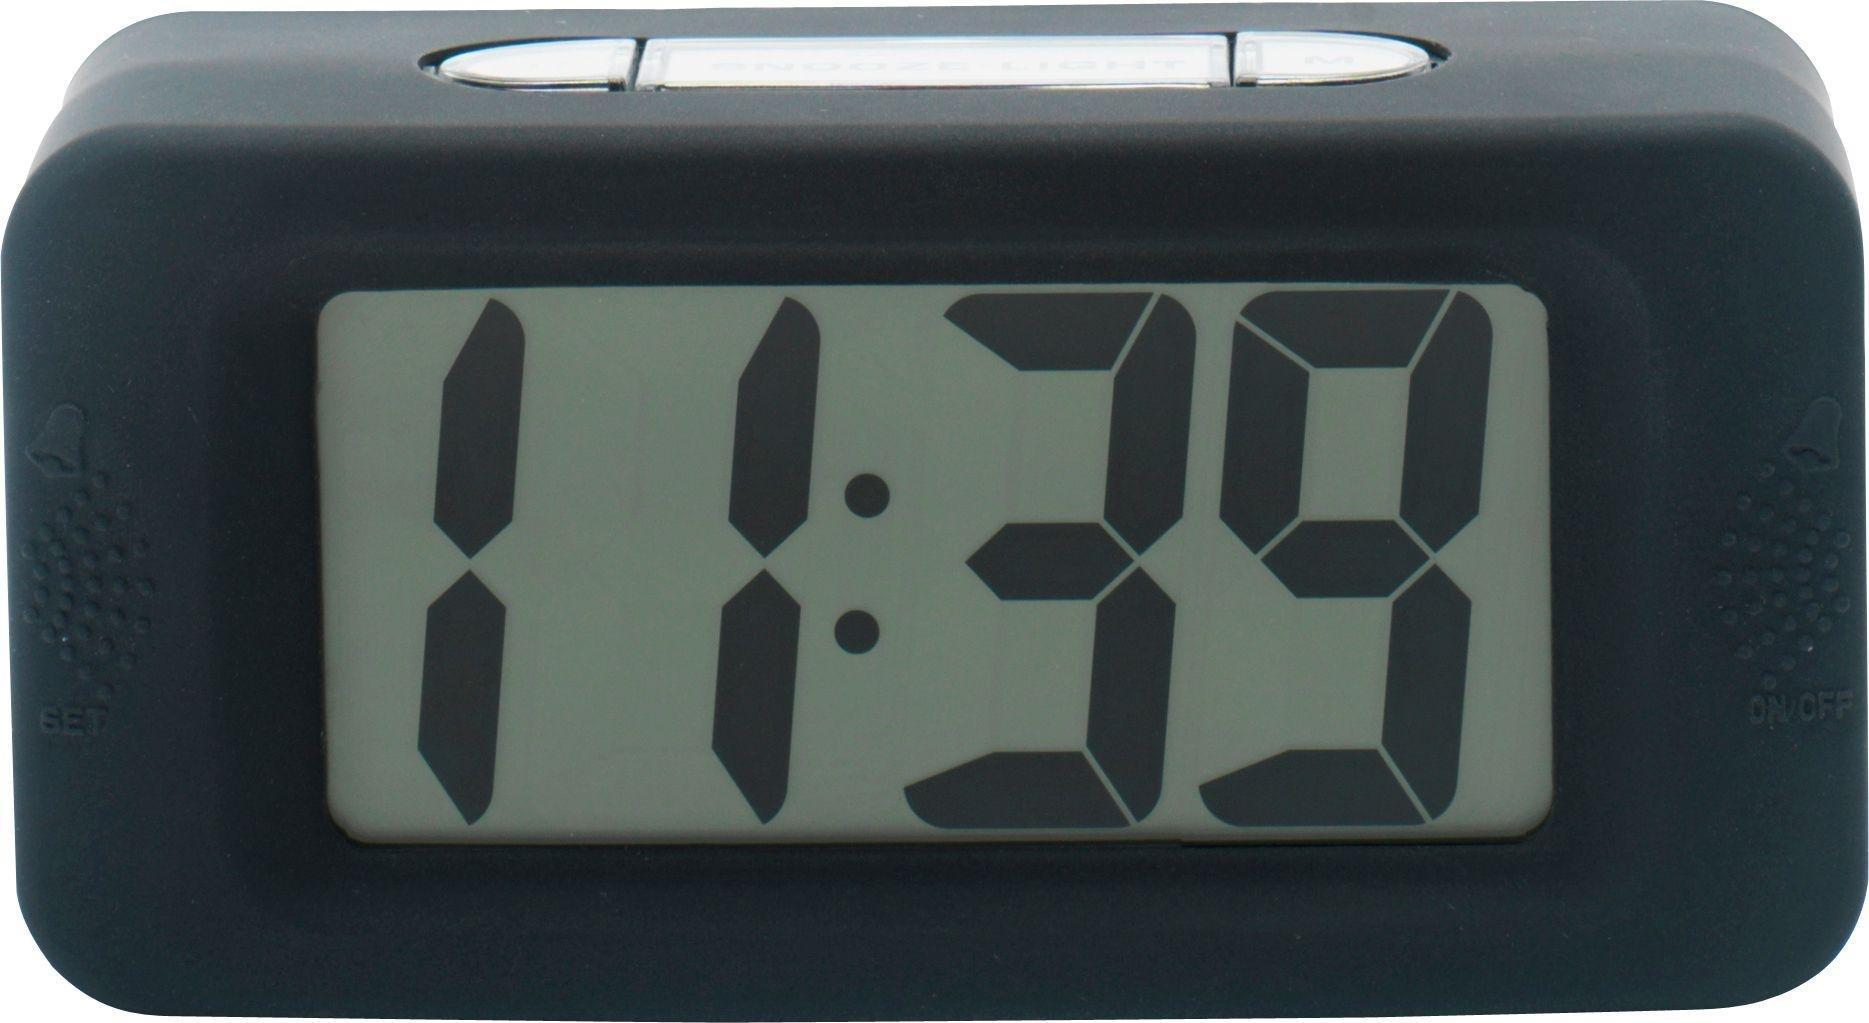 Image of Acctim Black LCD Alarm Clock